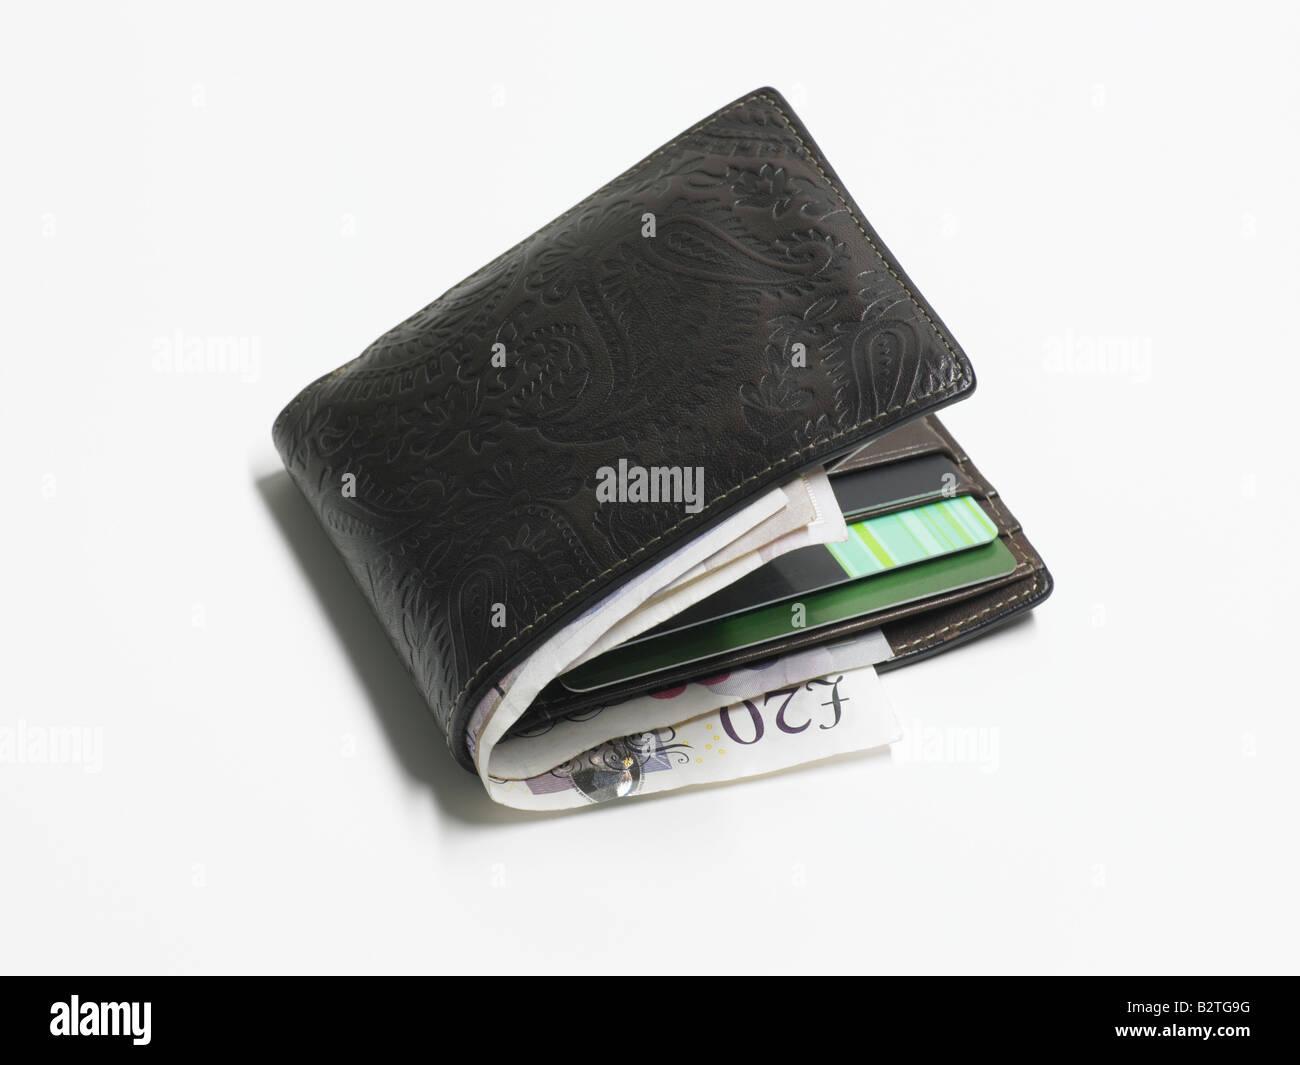 97ef1b50200 Full Wallet Imágenes De Stock   Full Wallet Fotos De Stock - Alamy